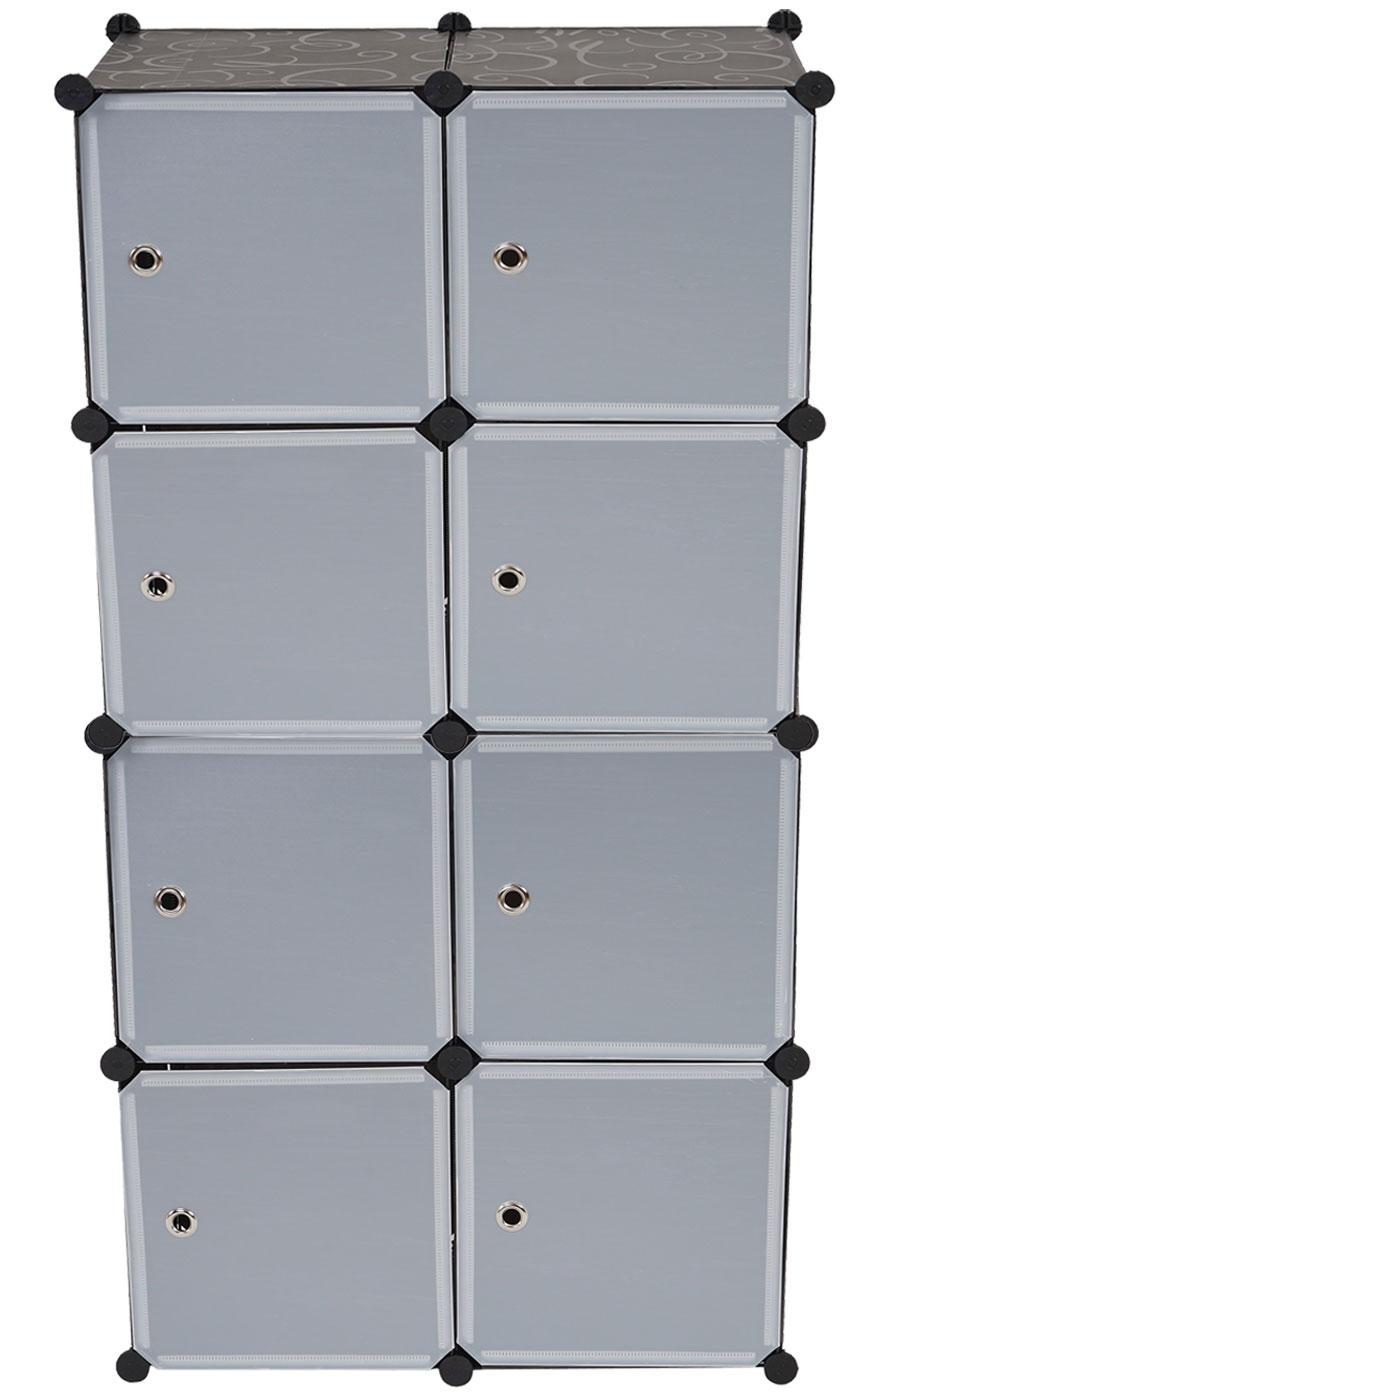 regalsystem sydney t307 steckregal 8 boxen je 36x36x36cm schwarz kaufen bei mendler. Black Bedroom Furniture Sets. Home Design Ideas